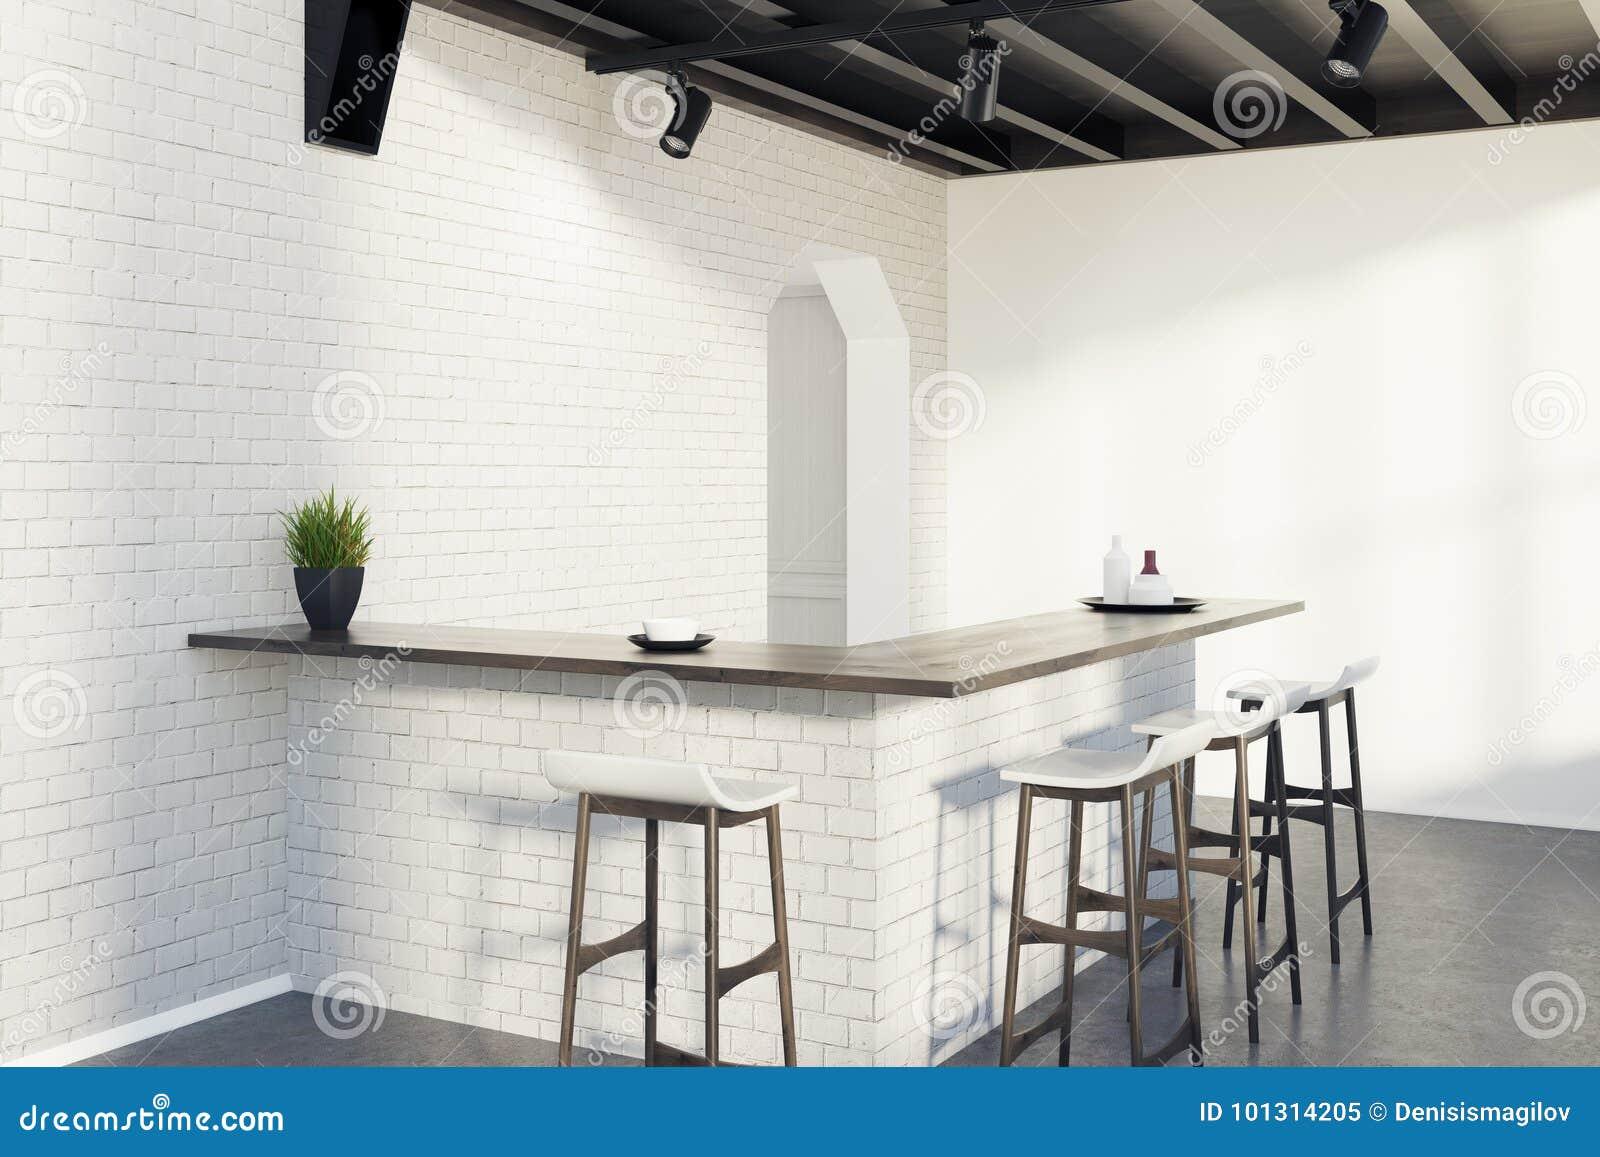 Brick Kitchen Bar, Stools And A Door, Gray Corner Stock ...